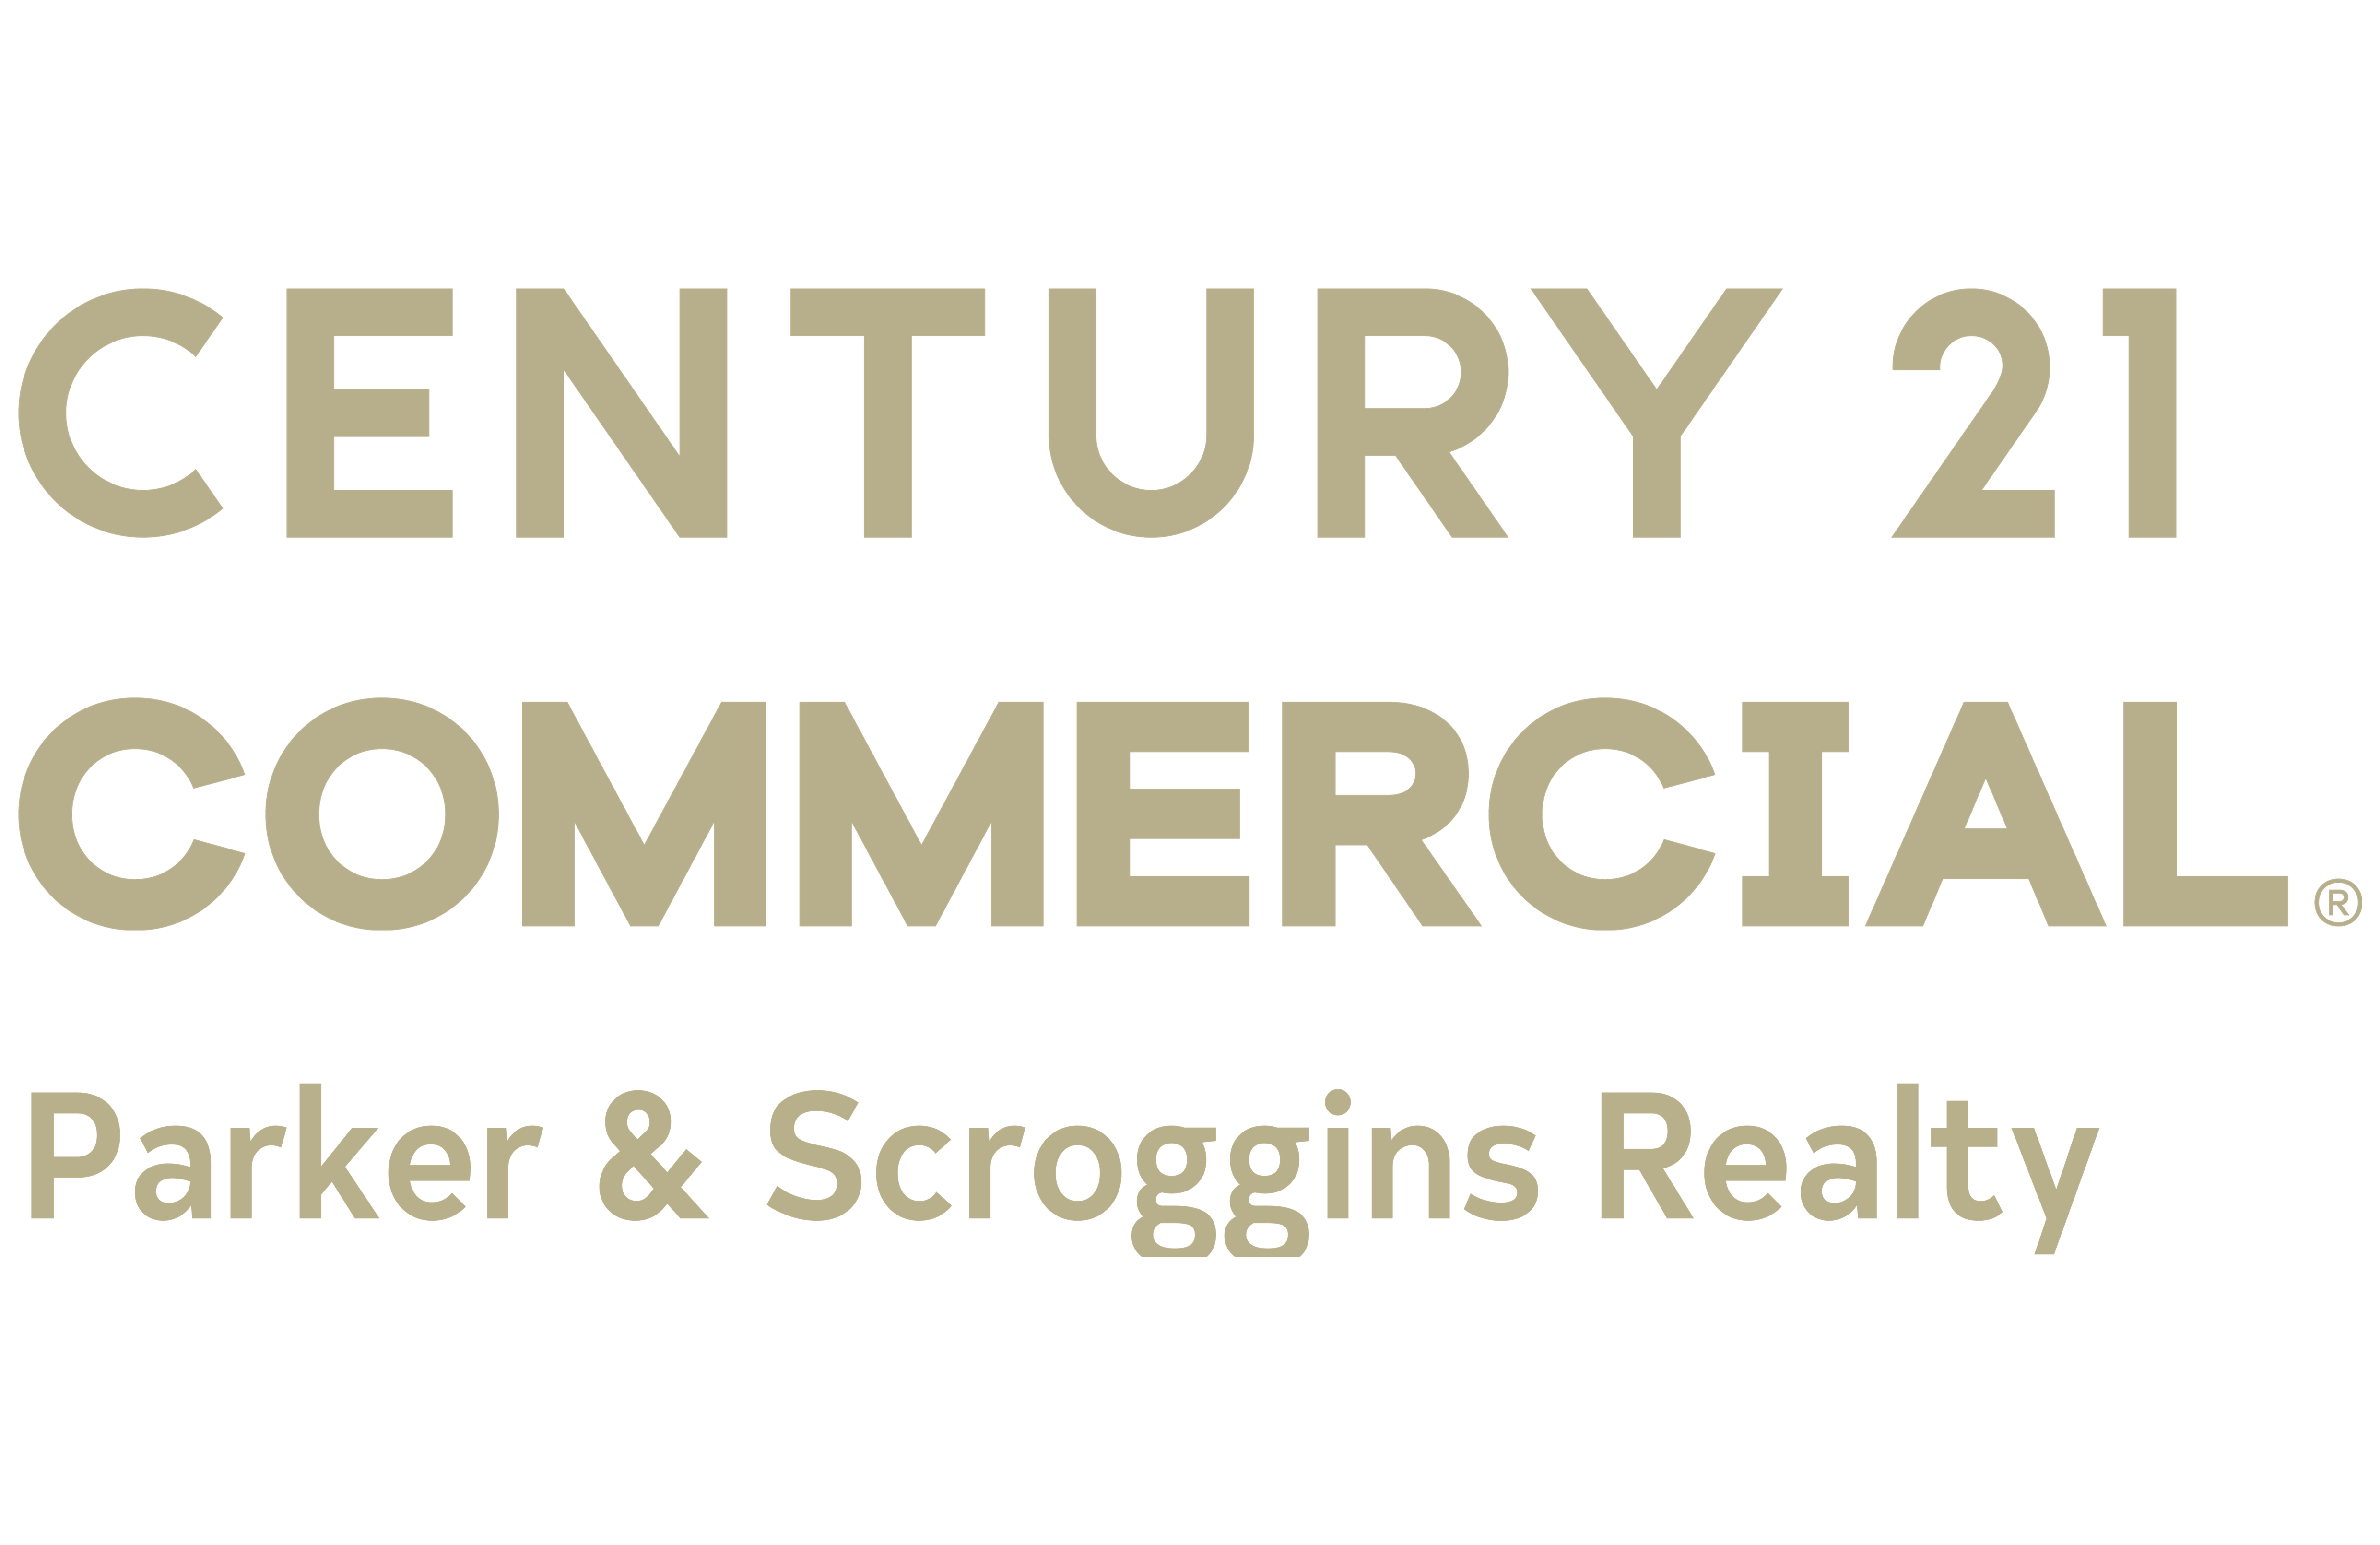 Parker Scroggins Team of CENTURY 21 Parker & Scroggins Realty logo